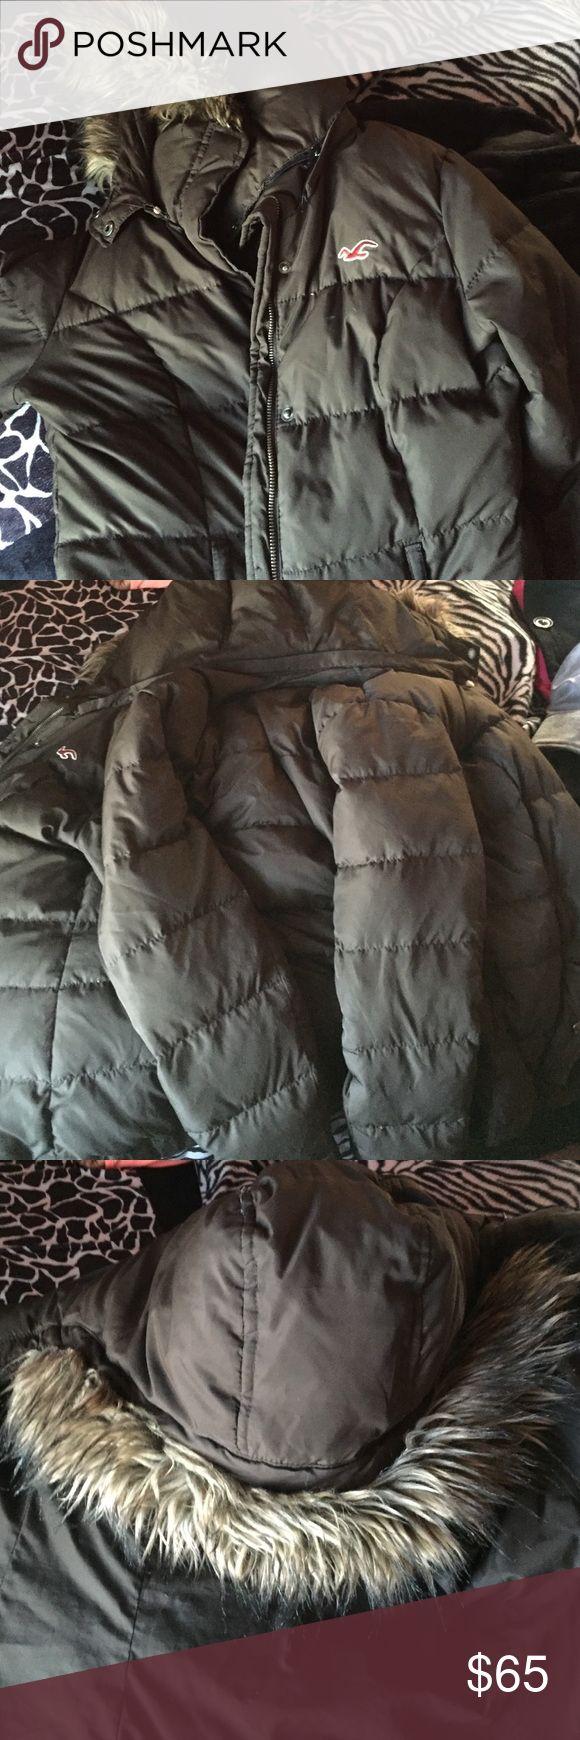 Hollister coat Brown Hollister coat Hollister Jackets & Coats Puffers